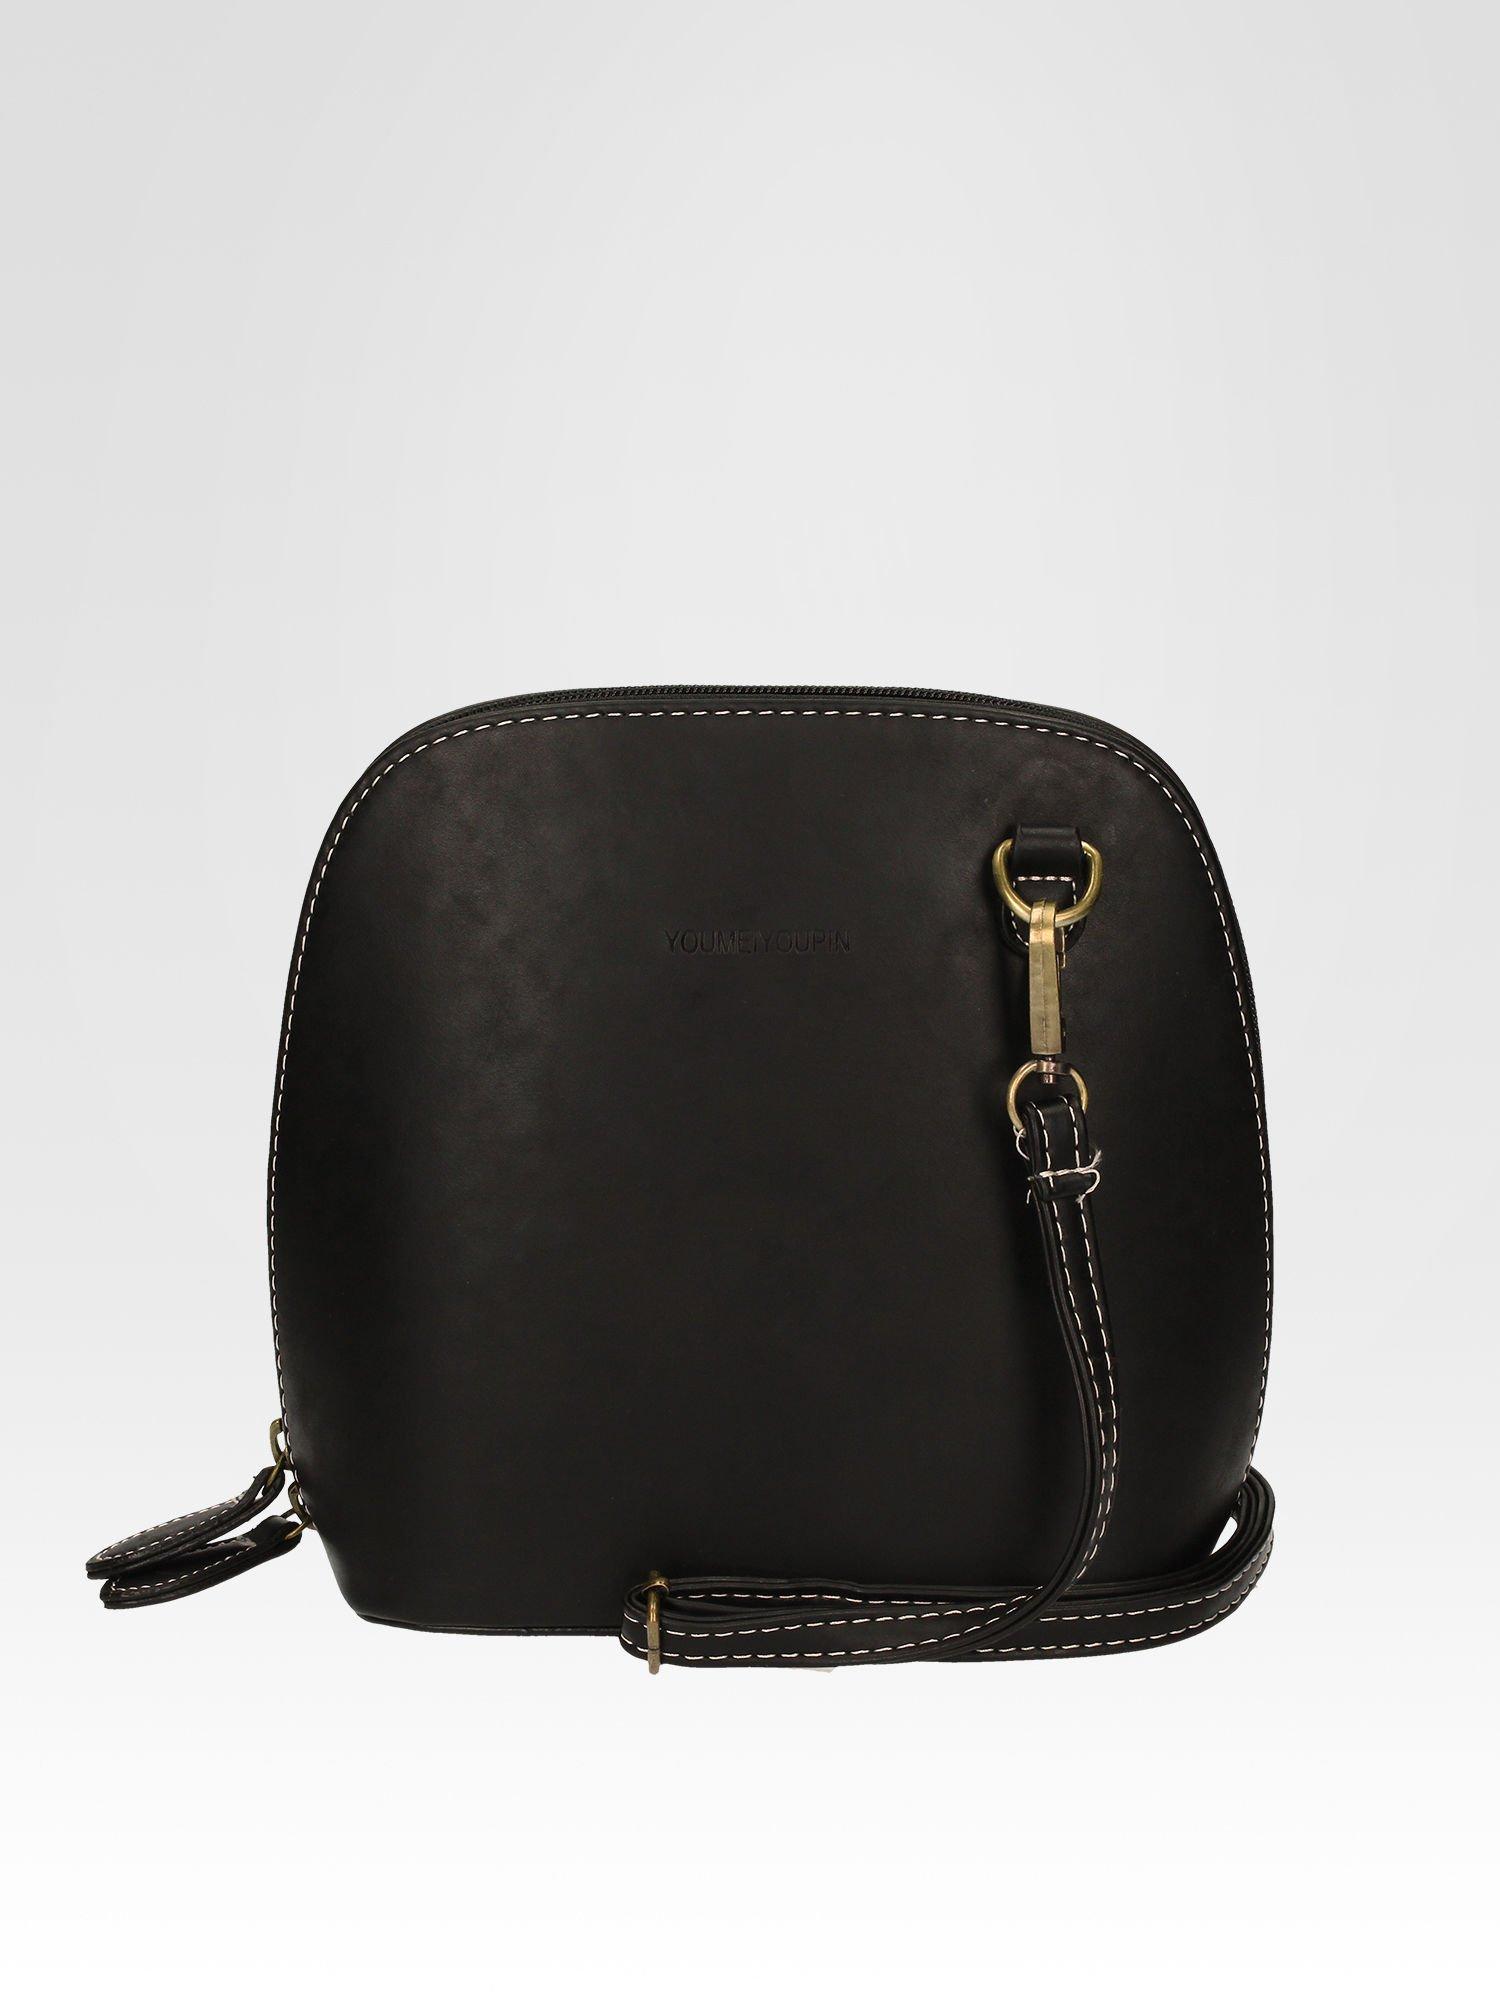 Czarna elegancka listonoszka z odpinanaym paskiem                                  zdj.                                  4